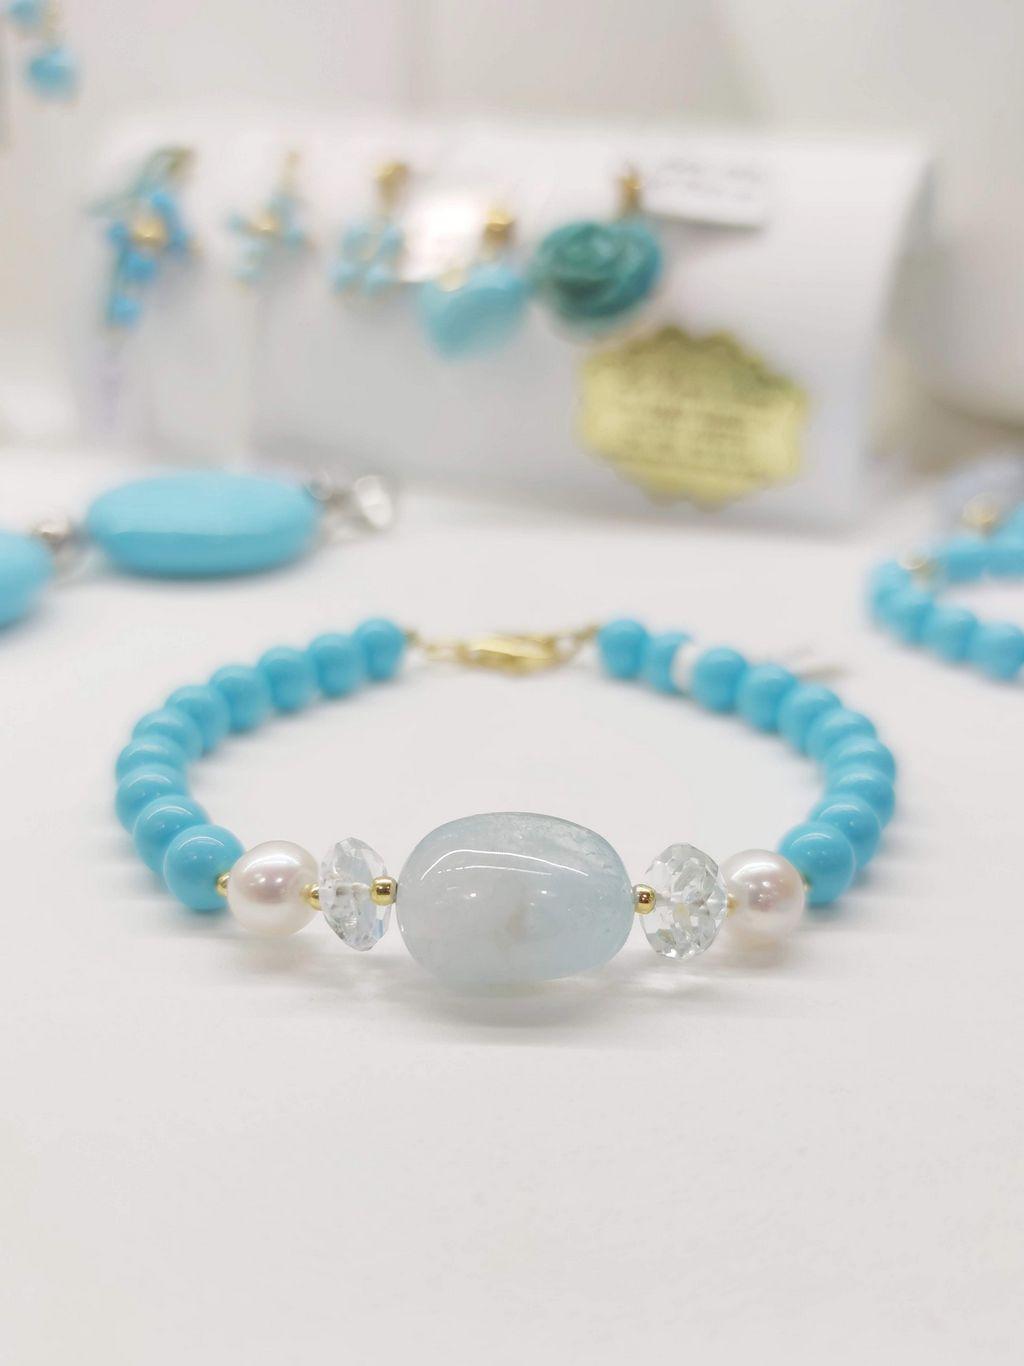 Bracciale acquamarina perle e pasta di turchese